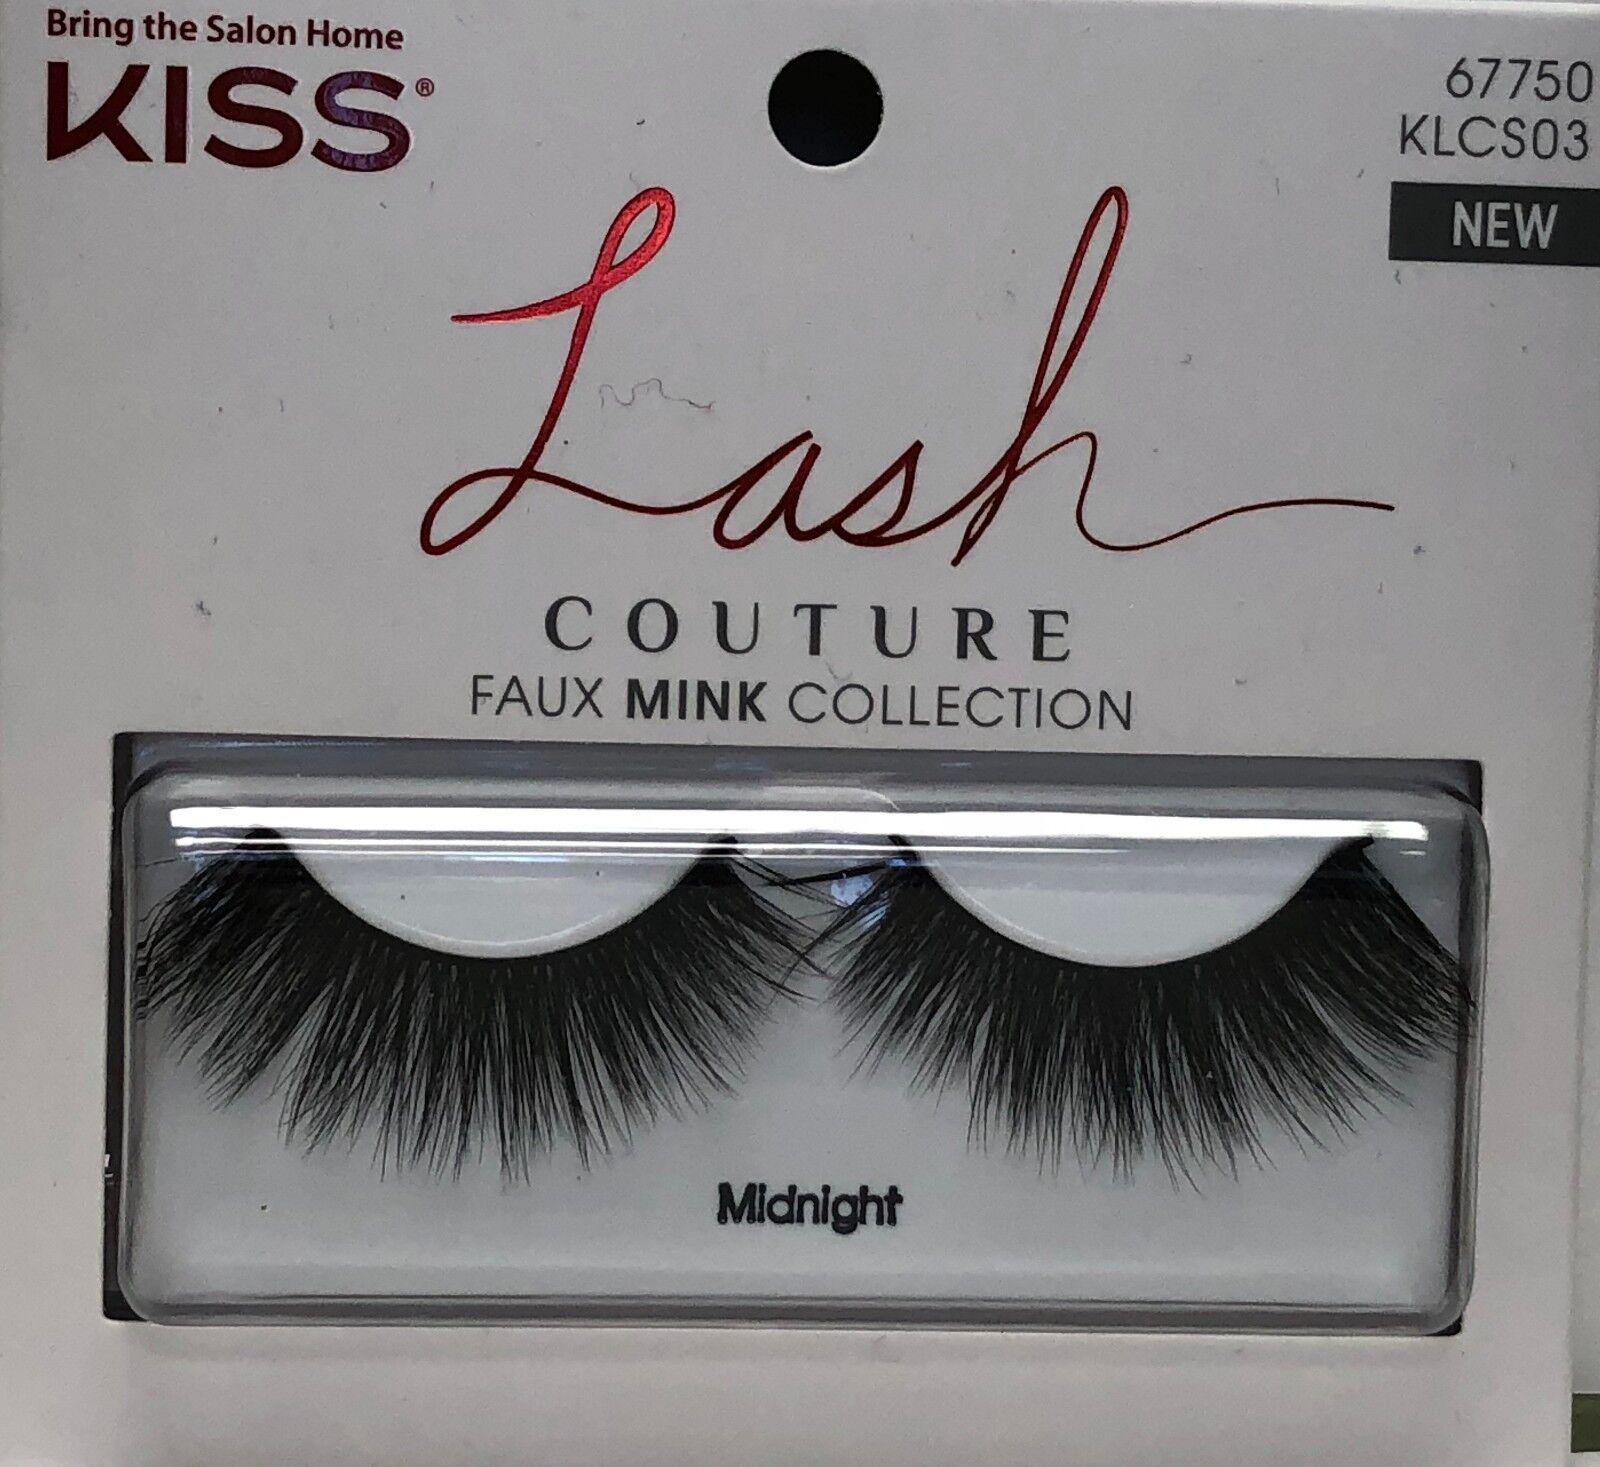 15434edda33 Kiss Lash Couture Faux Mink Midnight Bonus Glue 67750 for sale online | eBay